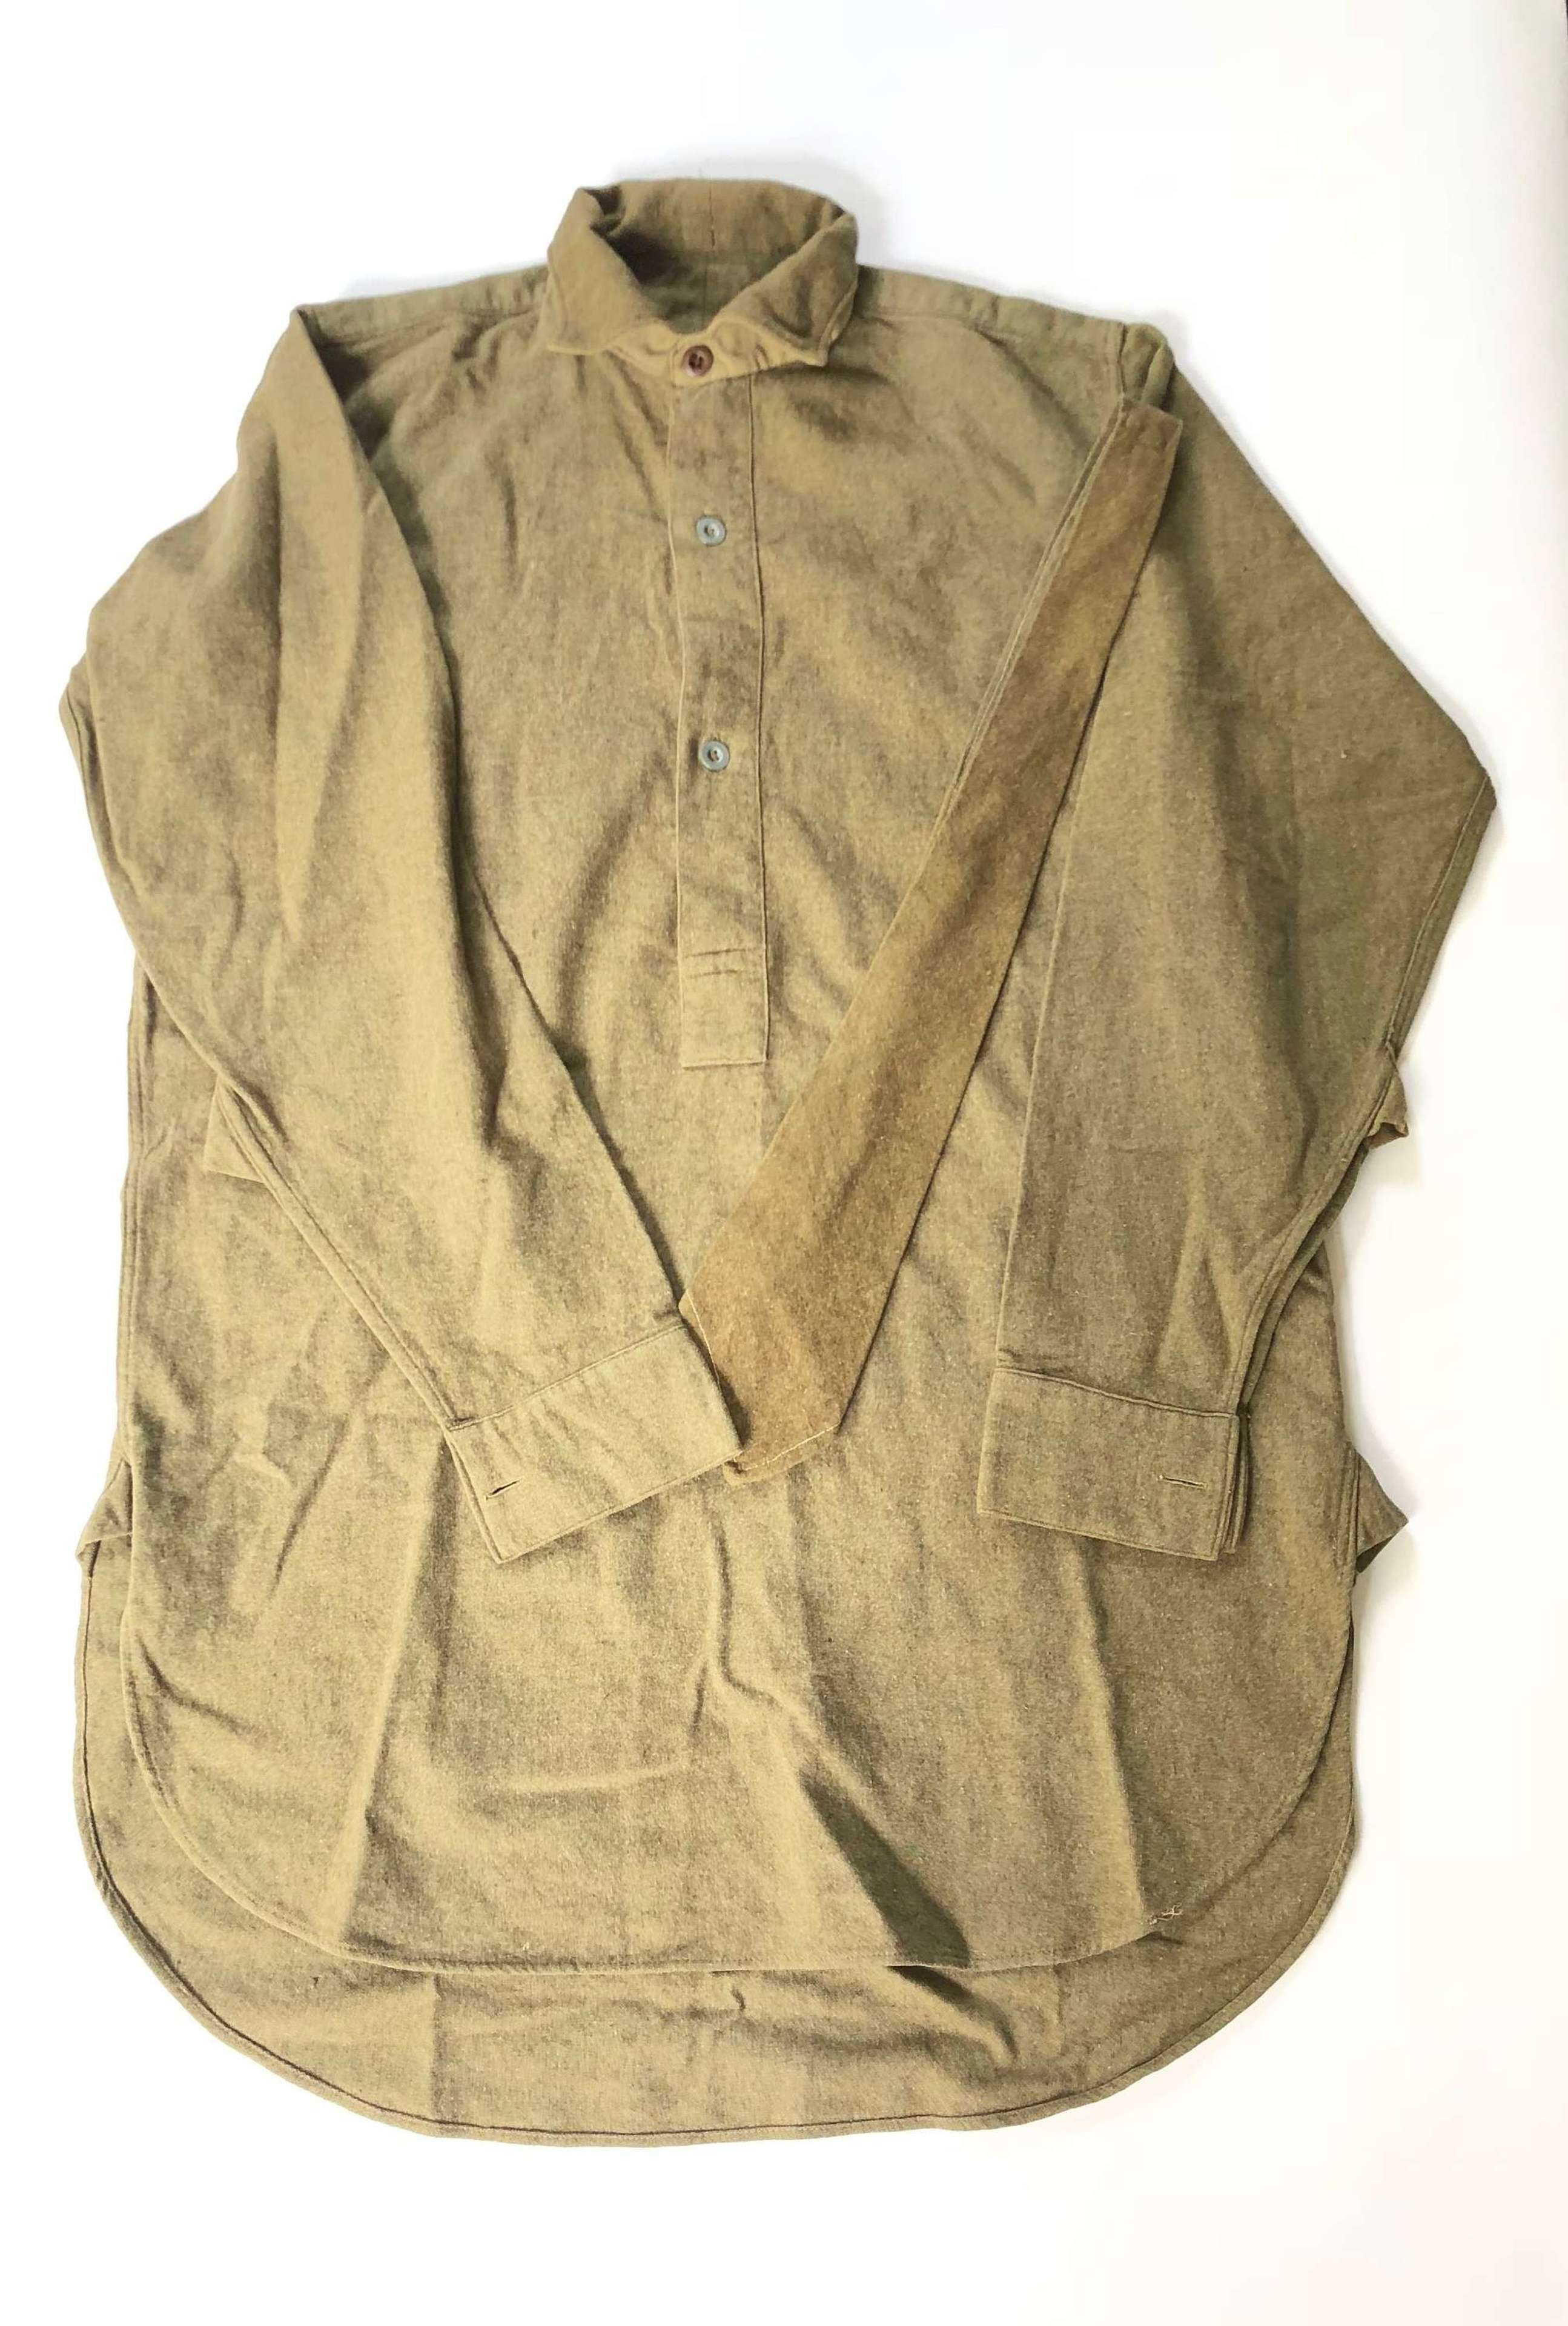 WW2 Pattern British Army Issue Shirt.